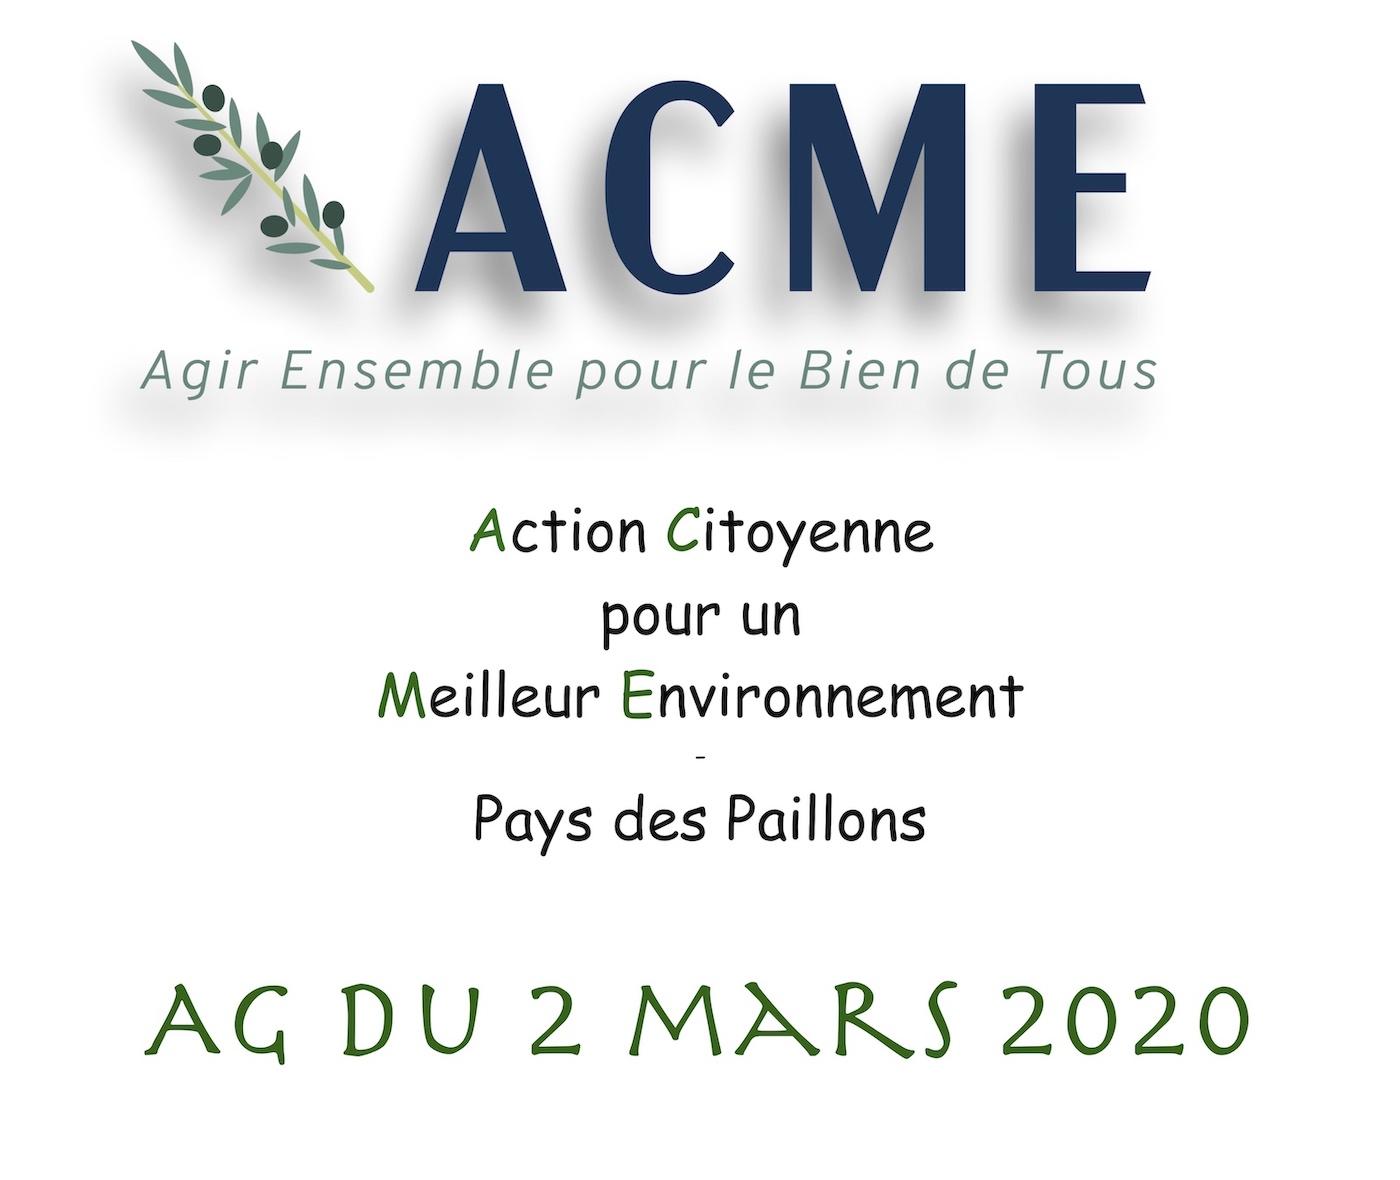 Compte-rendu de l'AG 2020